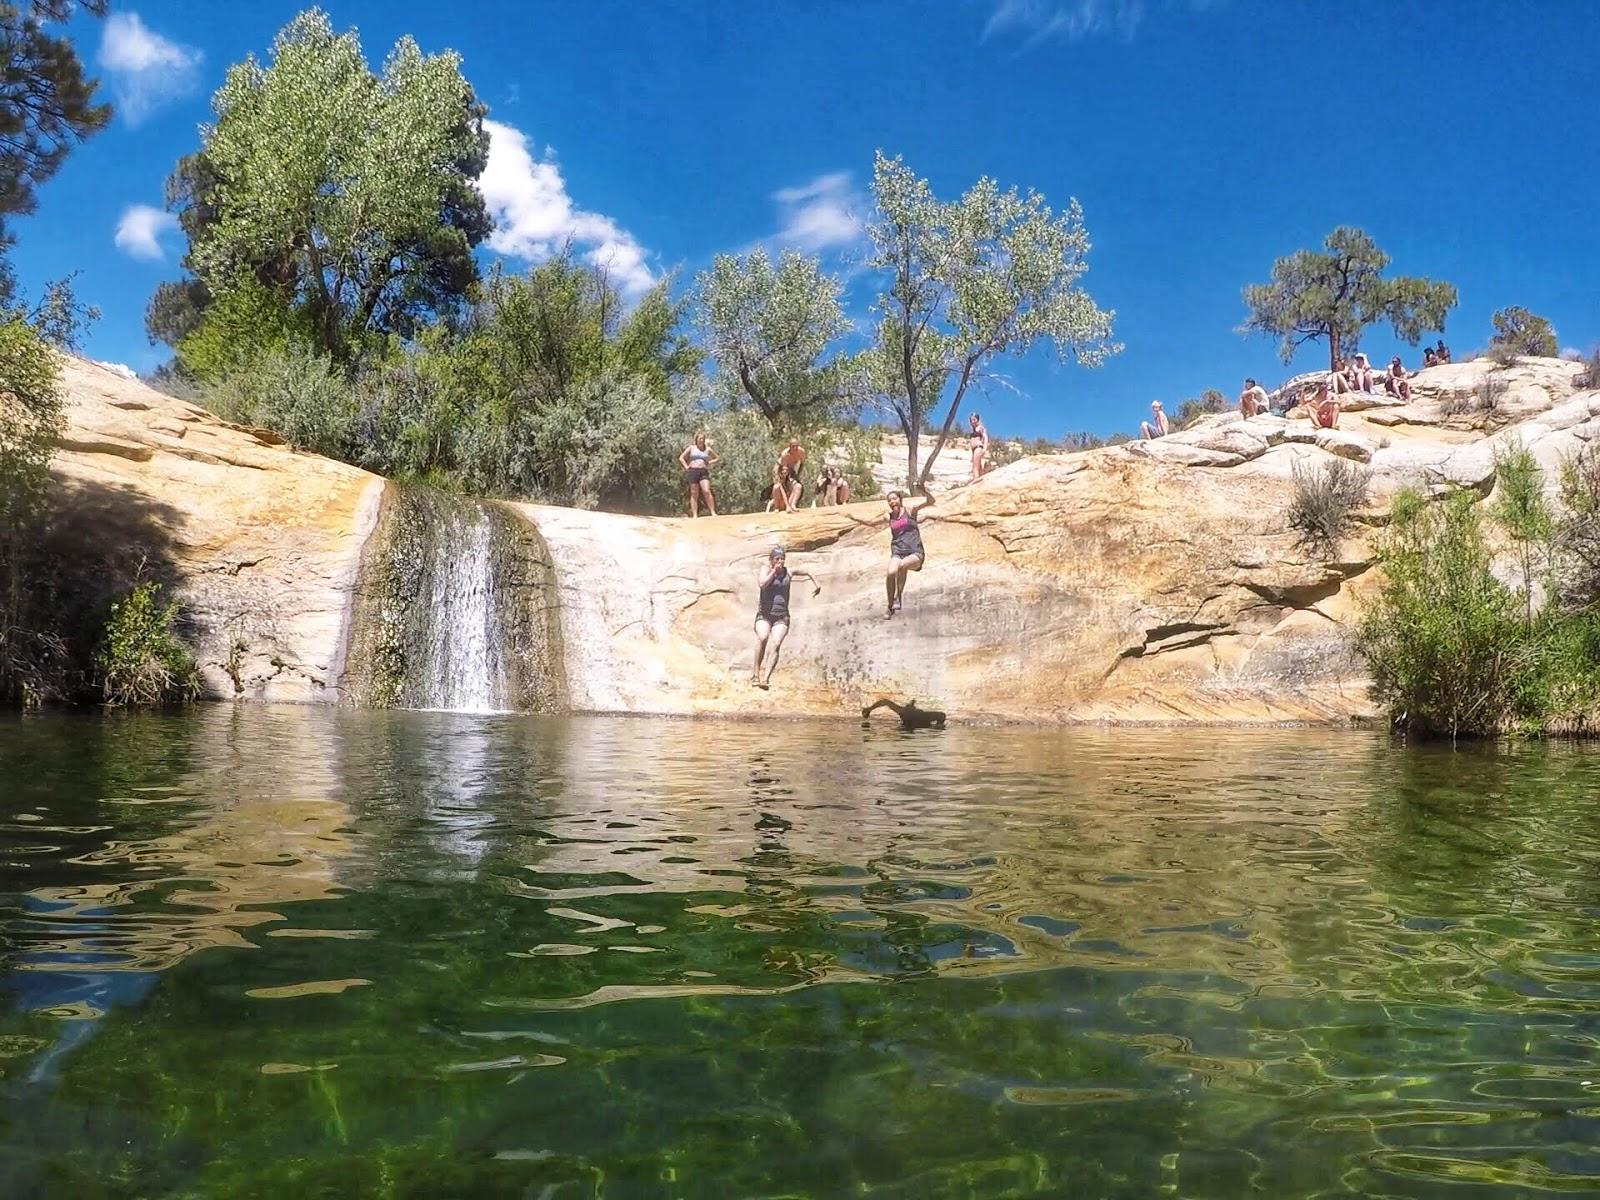 Hiking to Upper Calf Creek Falls